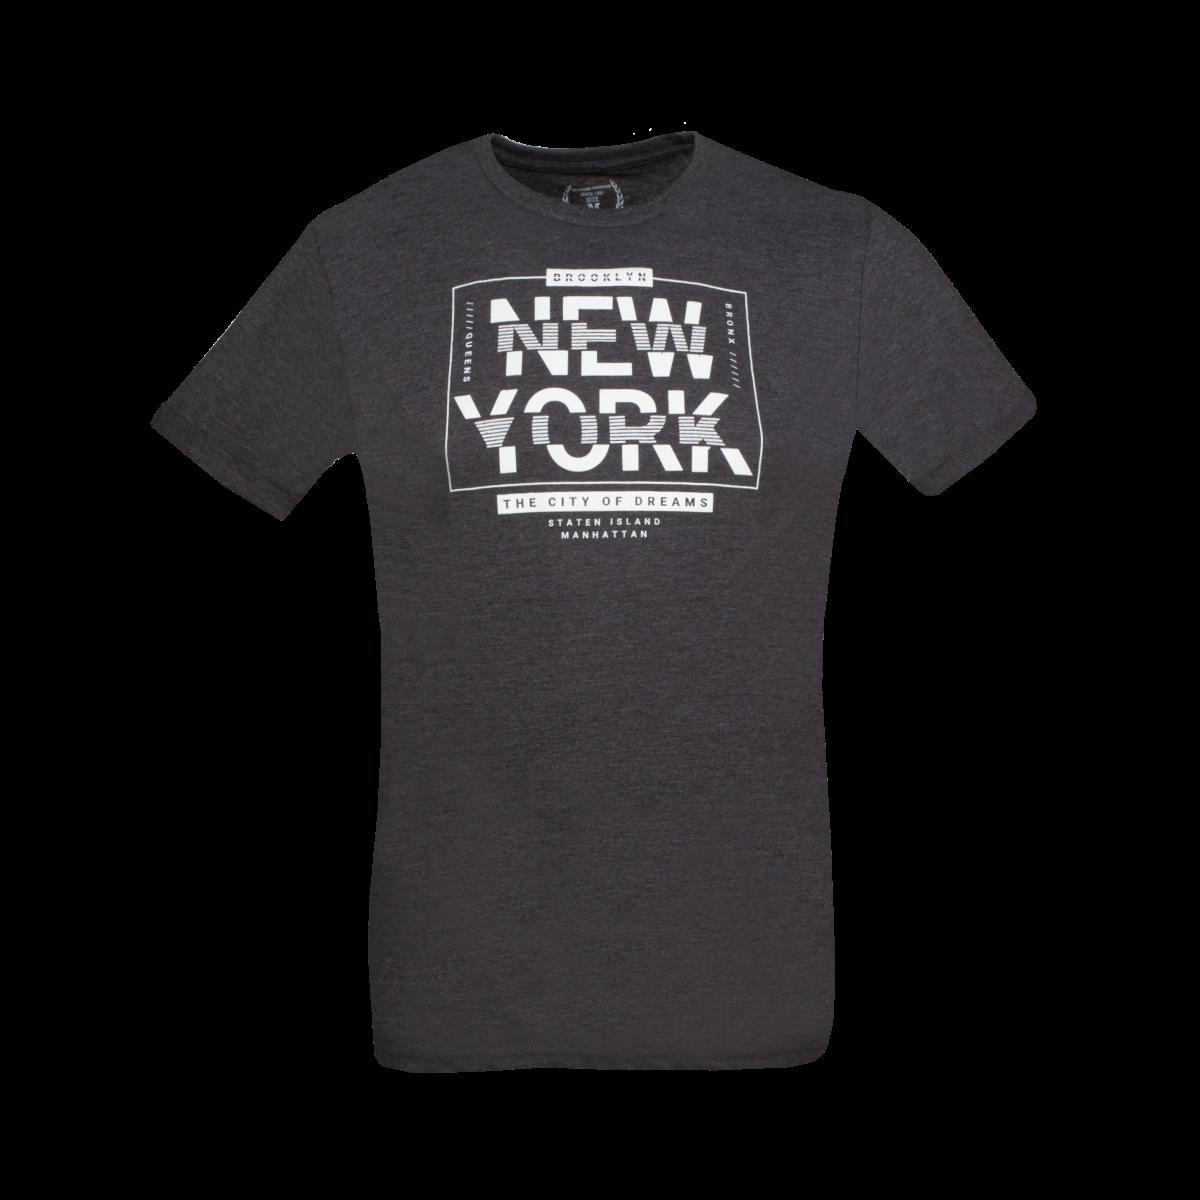 Moška majica, temno melange siva